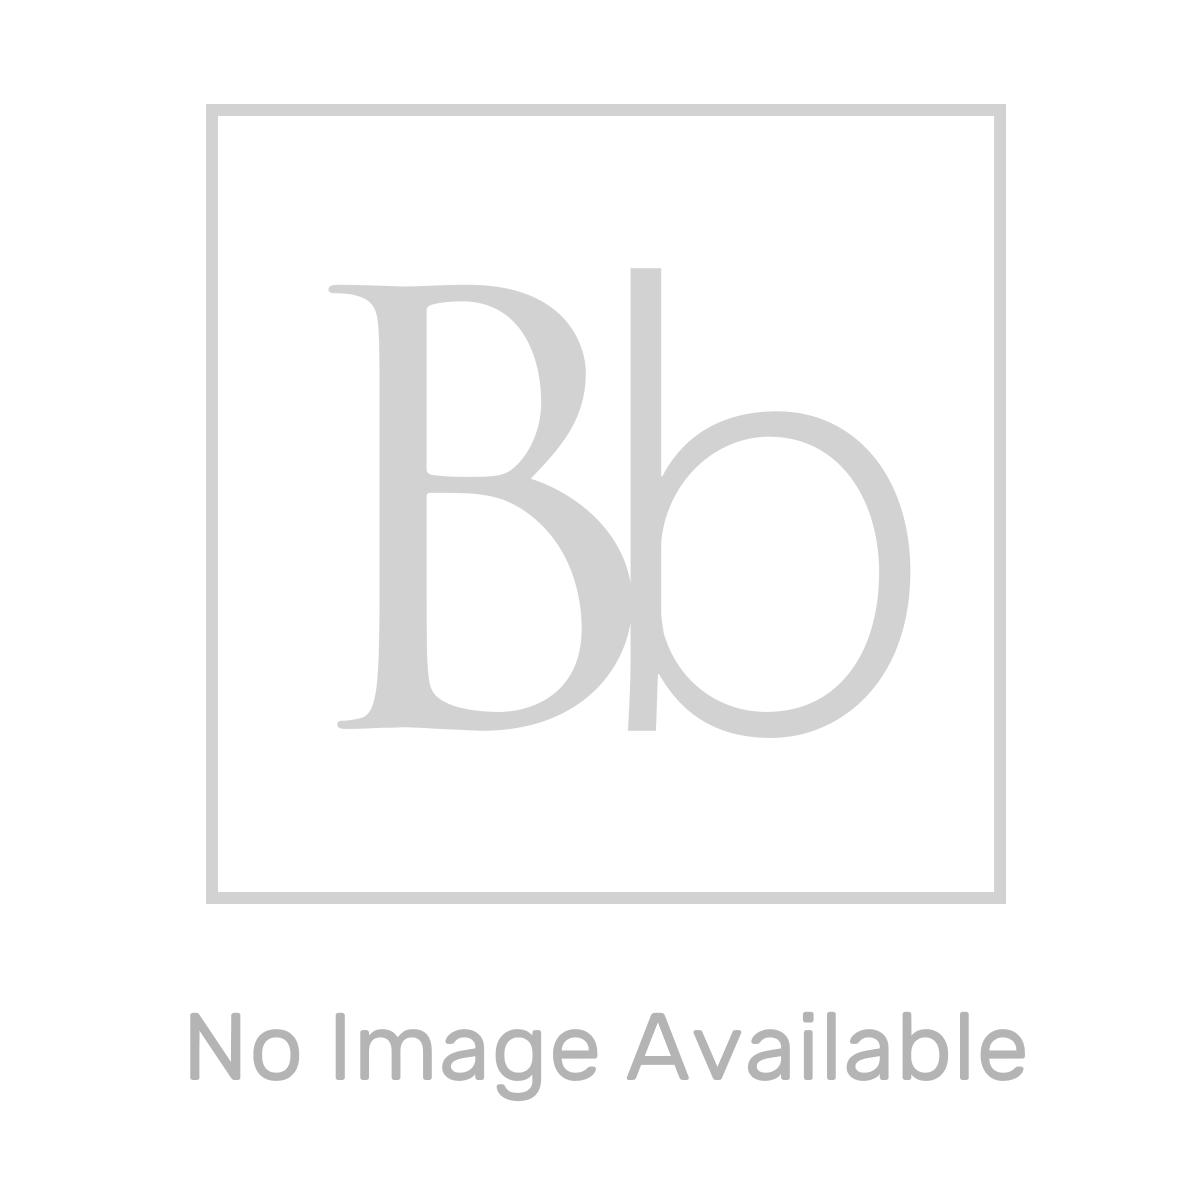 RAK Series 600 Toilet and 400 Series Medium Oak Vanity Unit